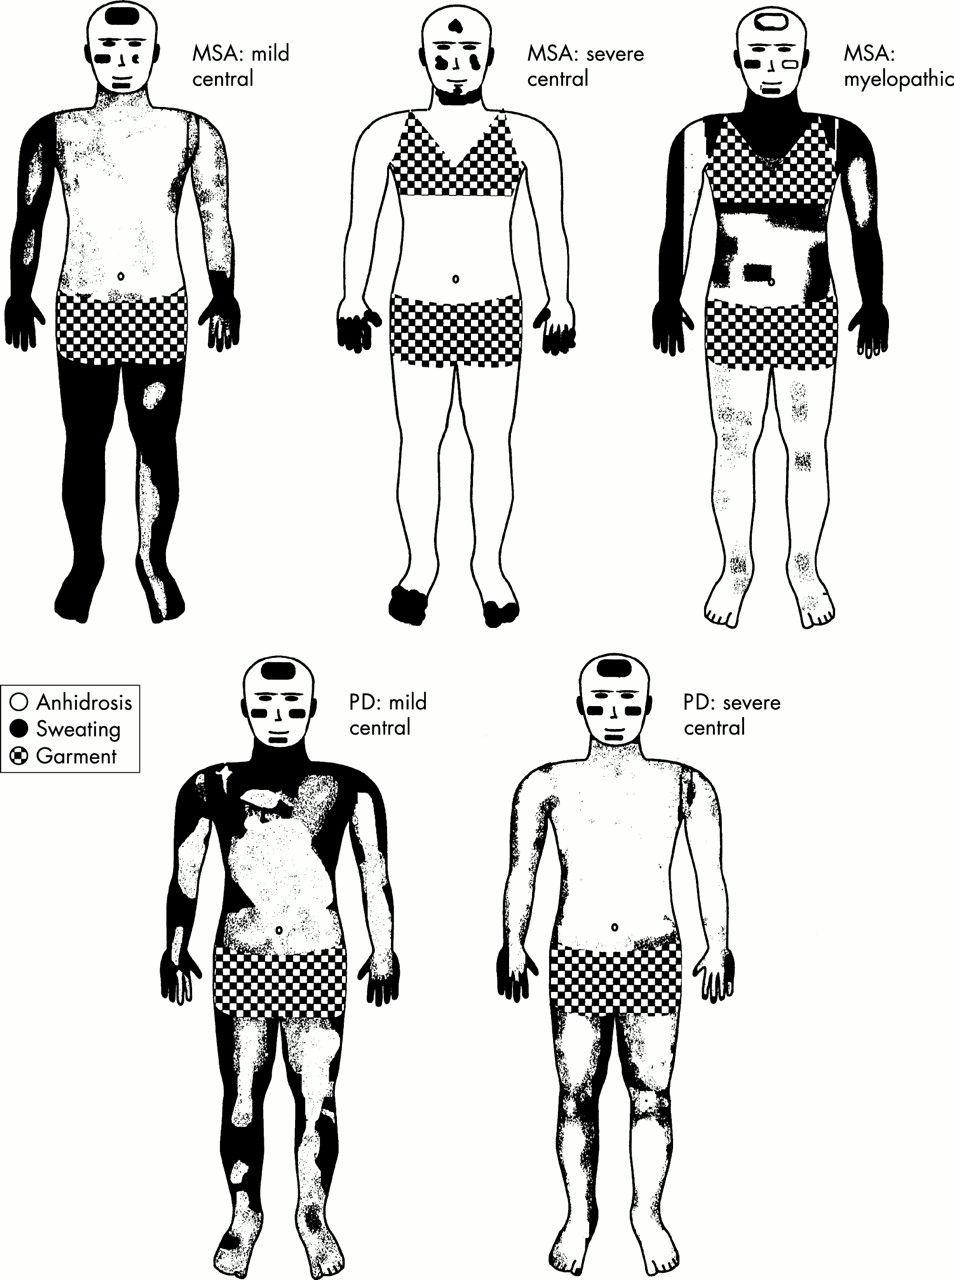 Autonomic nervous system testing may not distinguish